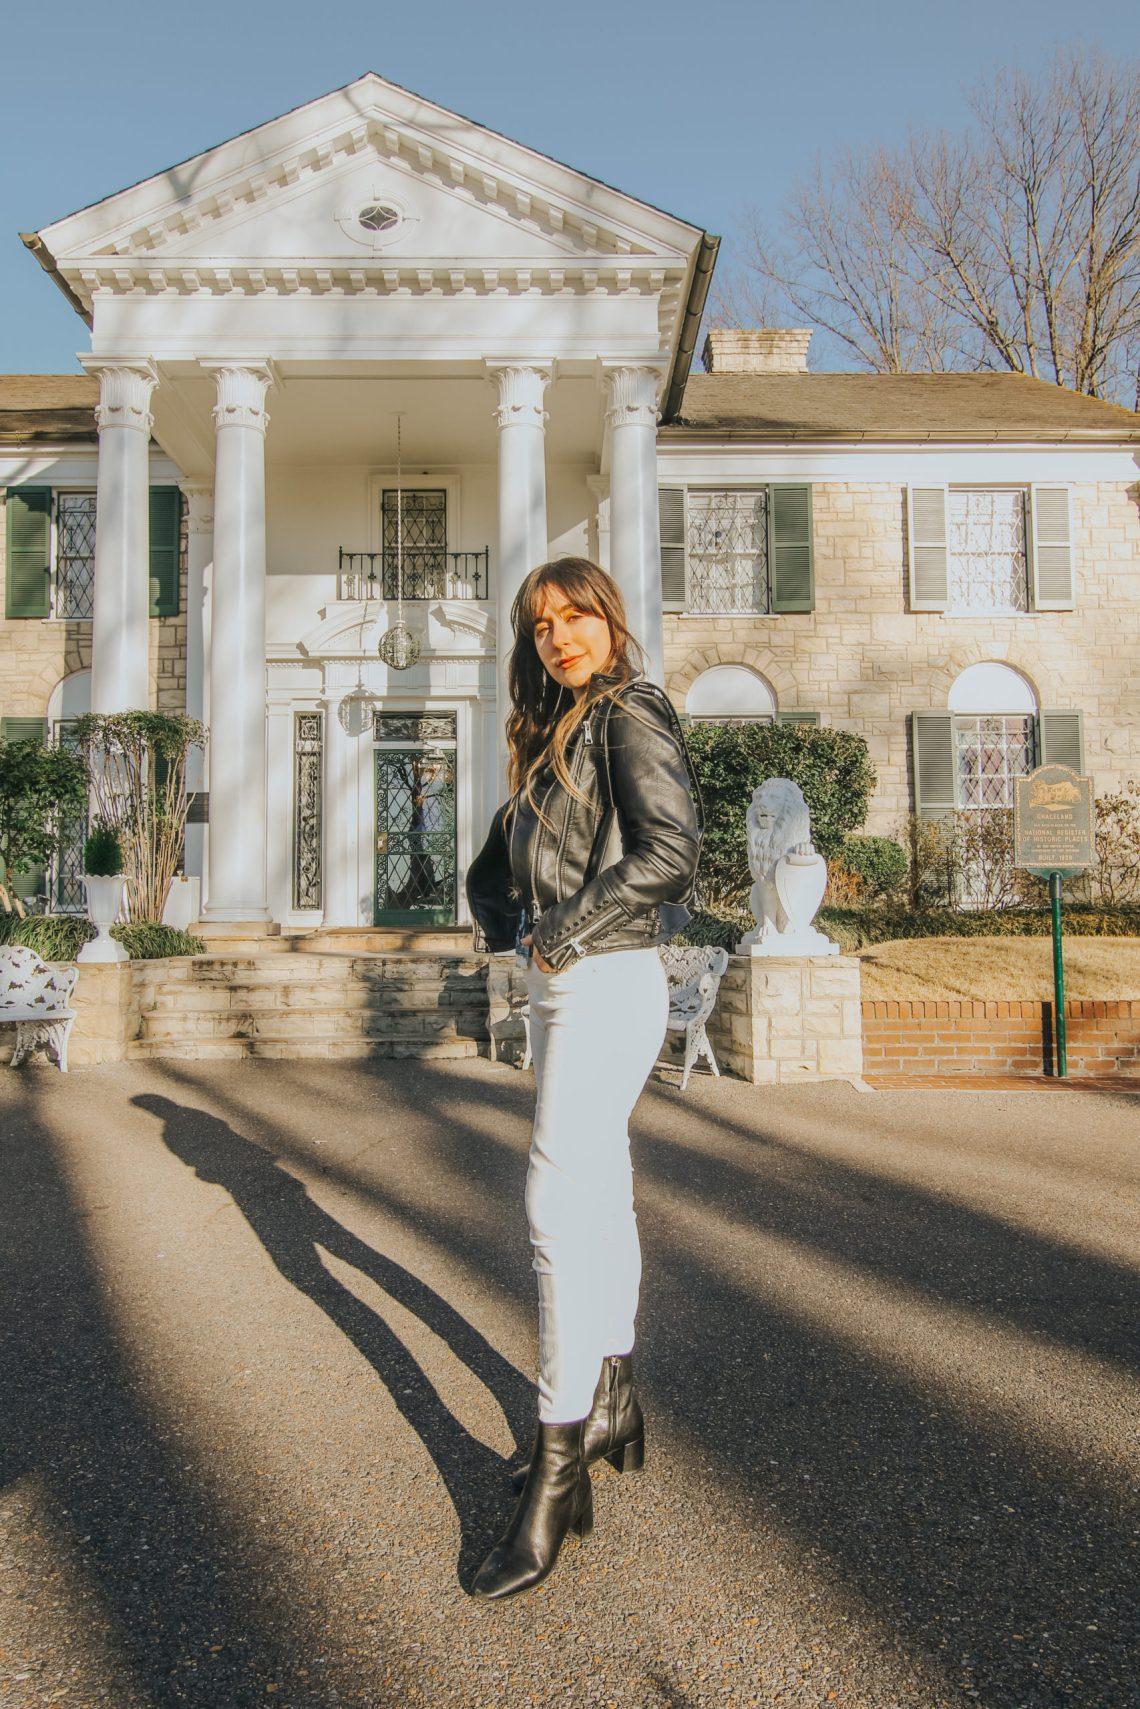 Graceland, Elvis Presley, Blues, Memphis, Tennessee, Memphis Travel Guide, travel guide, The Best Instagram Spots in Memphis, travel, The Urban Darling, fashion, boho fashion, bohemian.